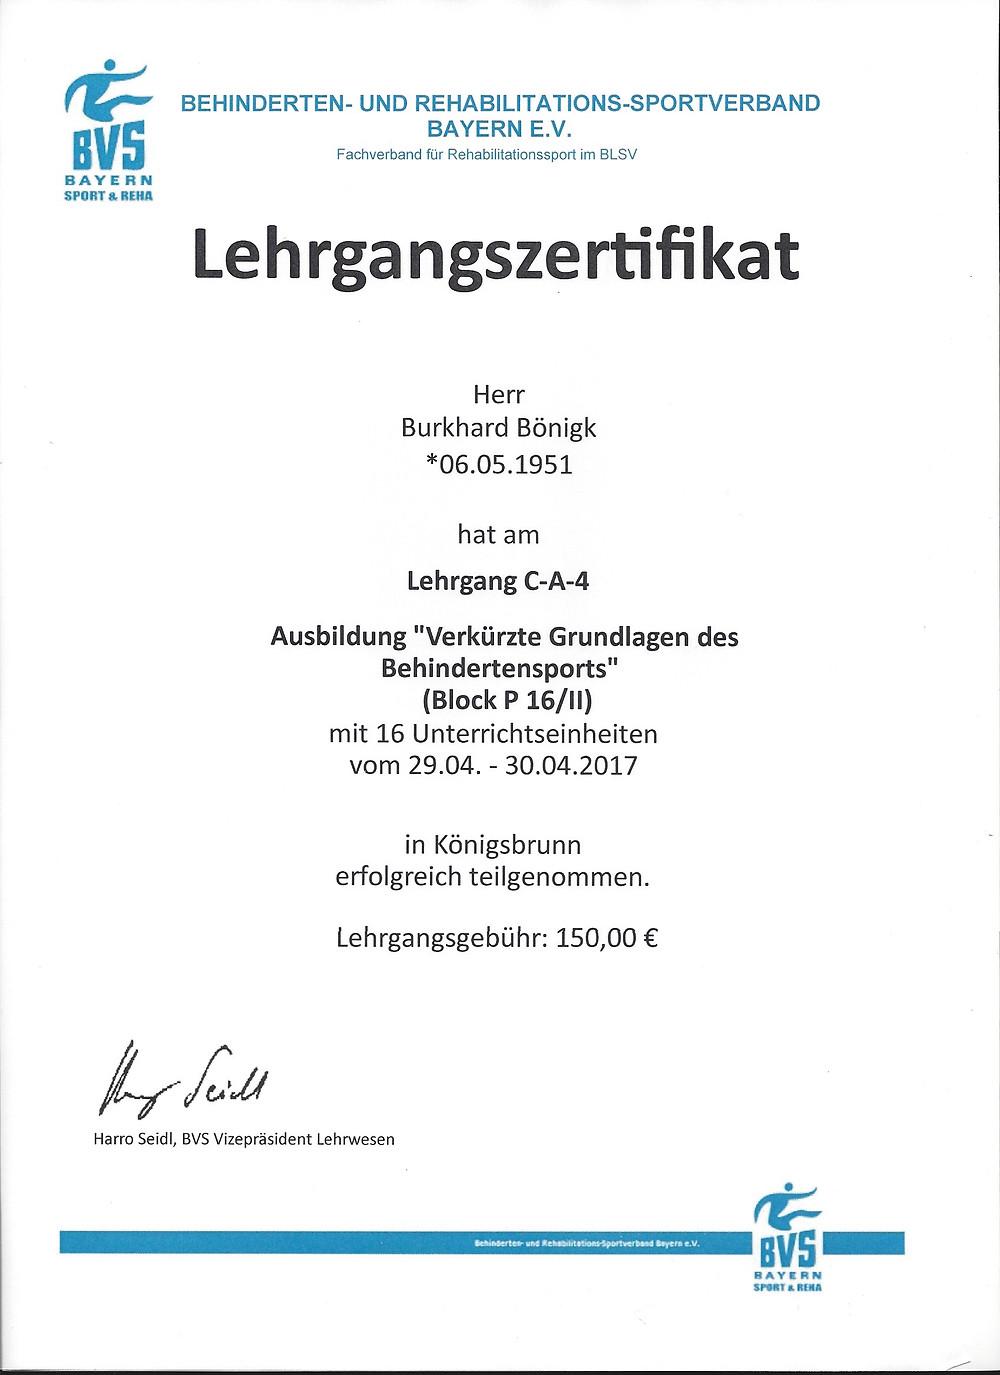 Laufinstinkt® Schwaben Augsburg - Übungsleiter Reha-Sport Zertifikat P16